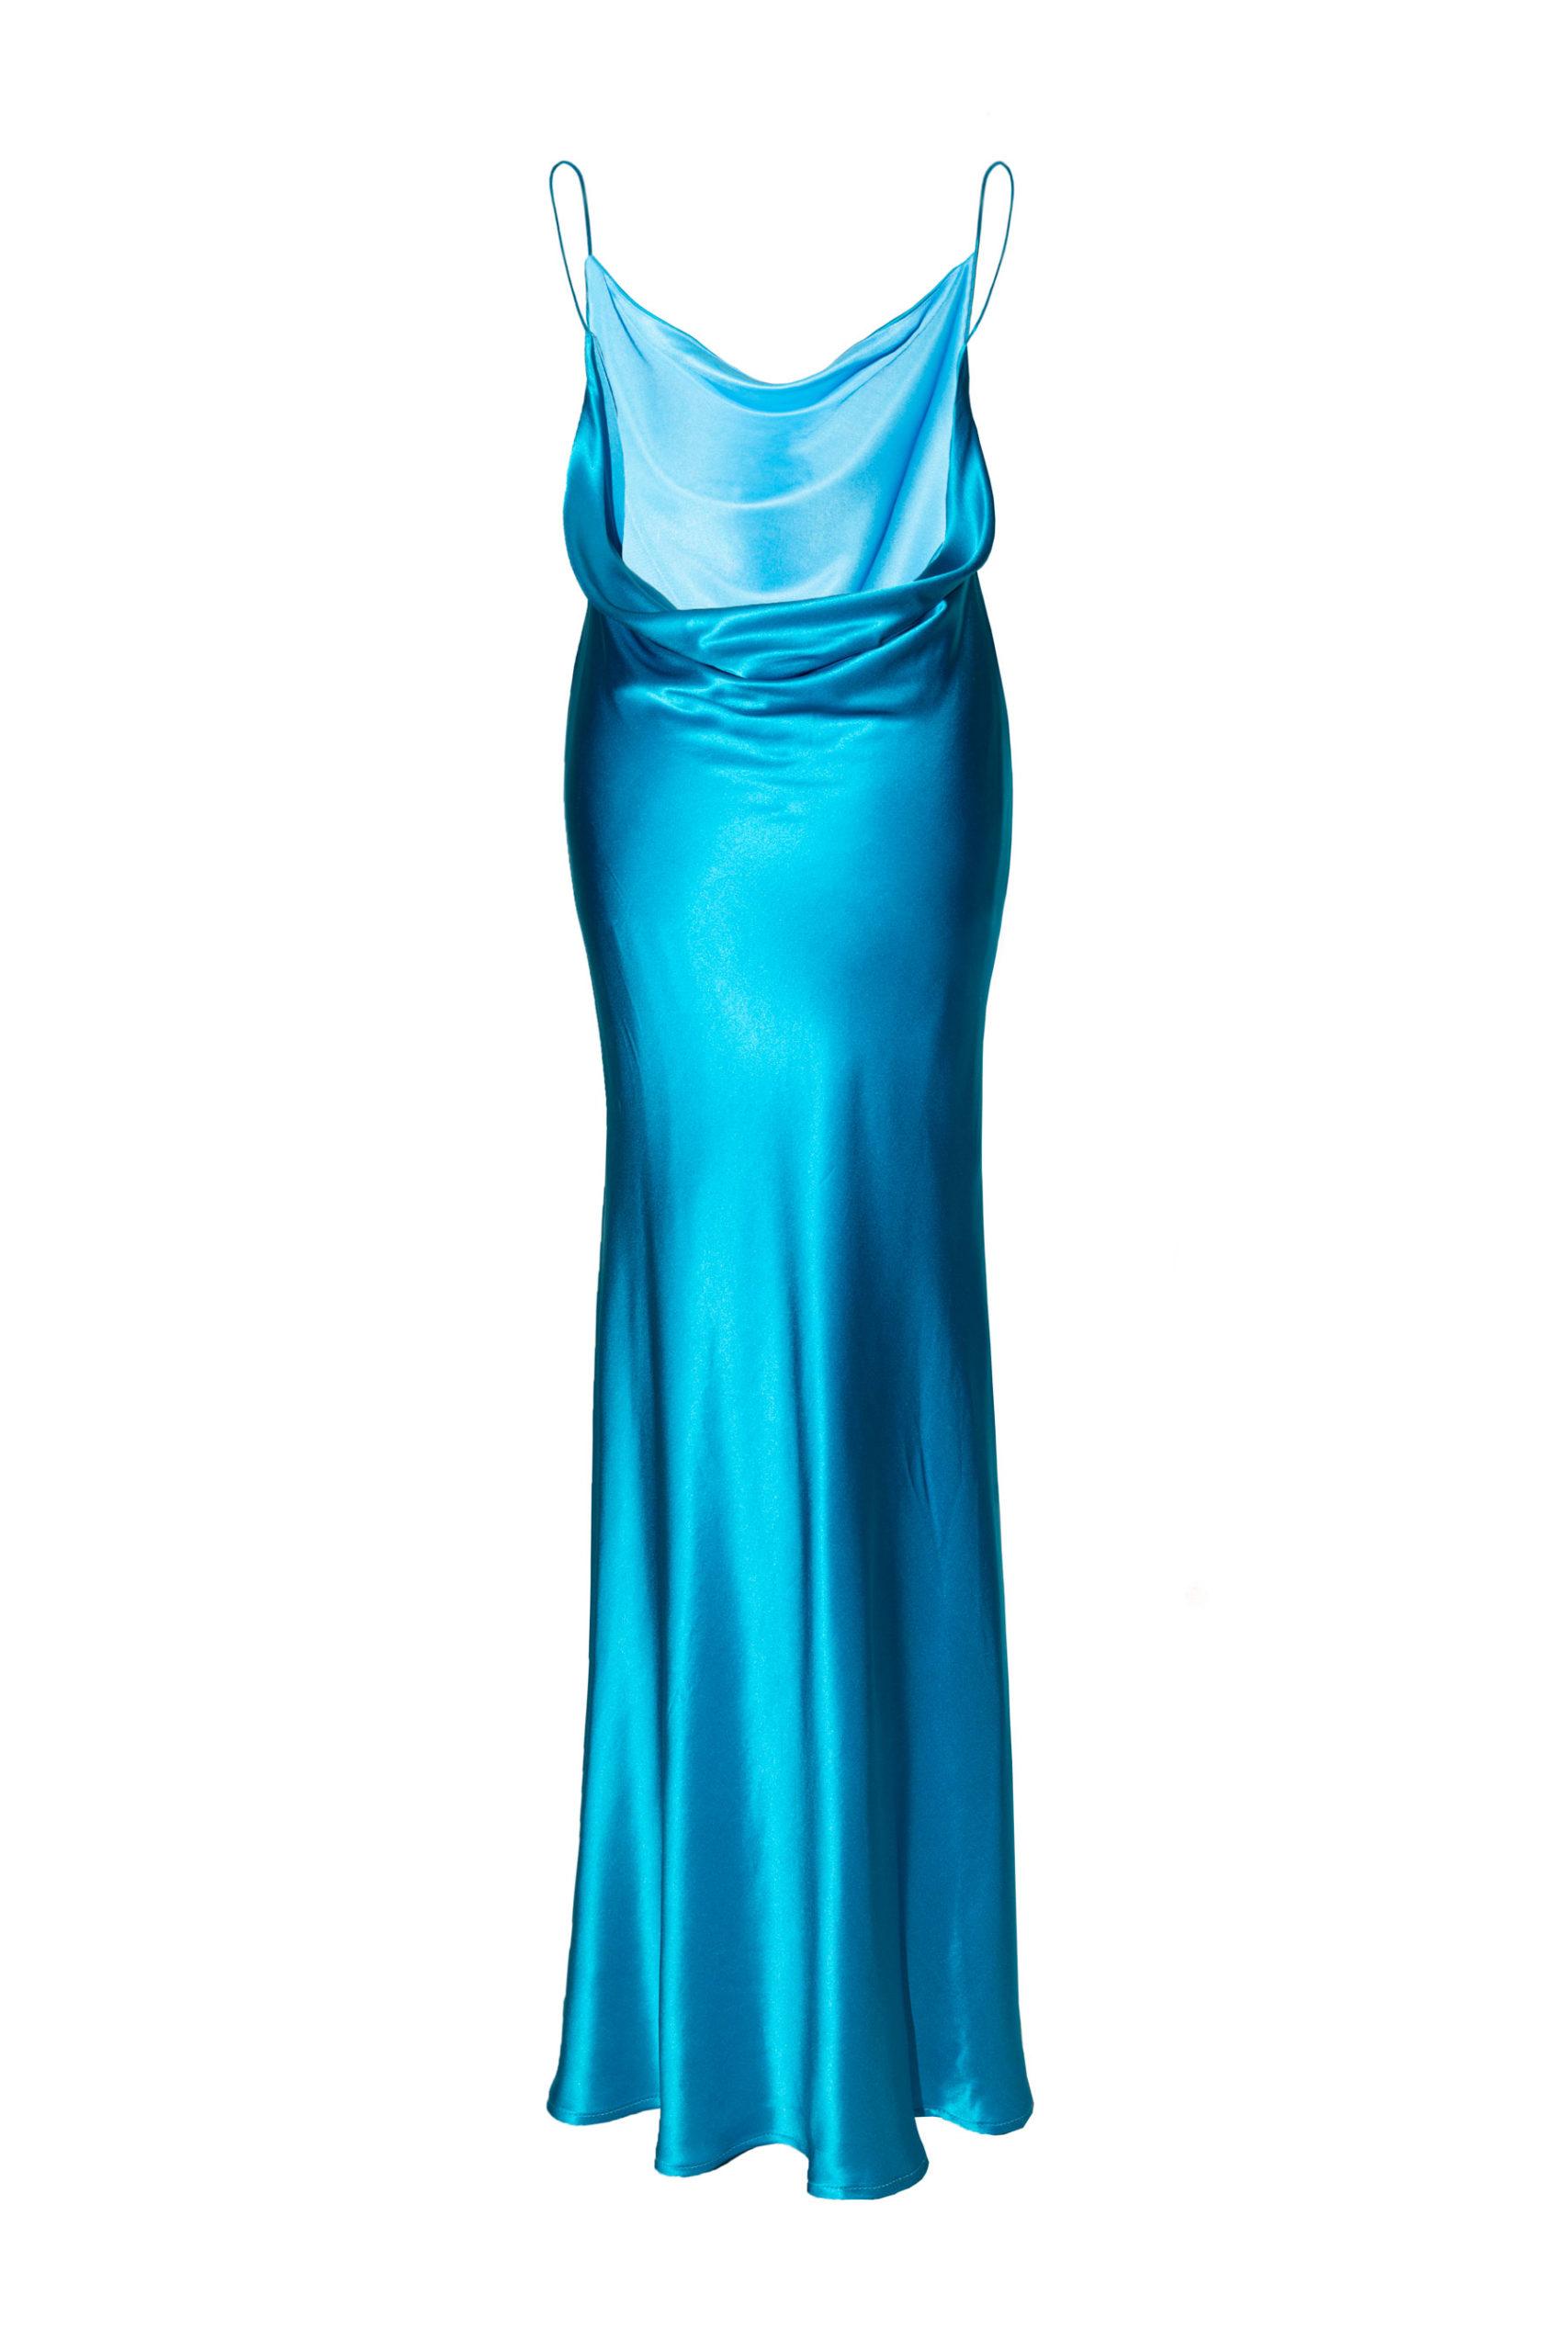 Frida blue natural silk dress